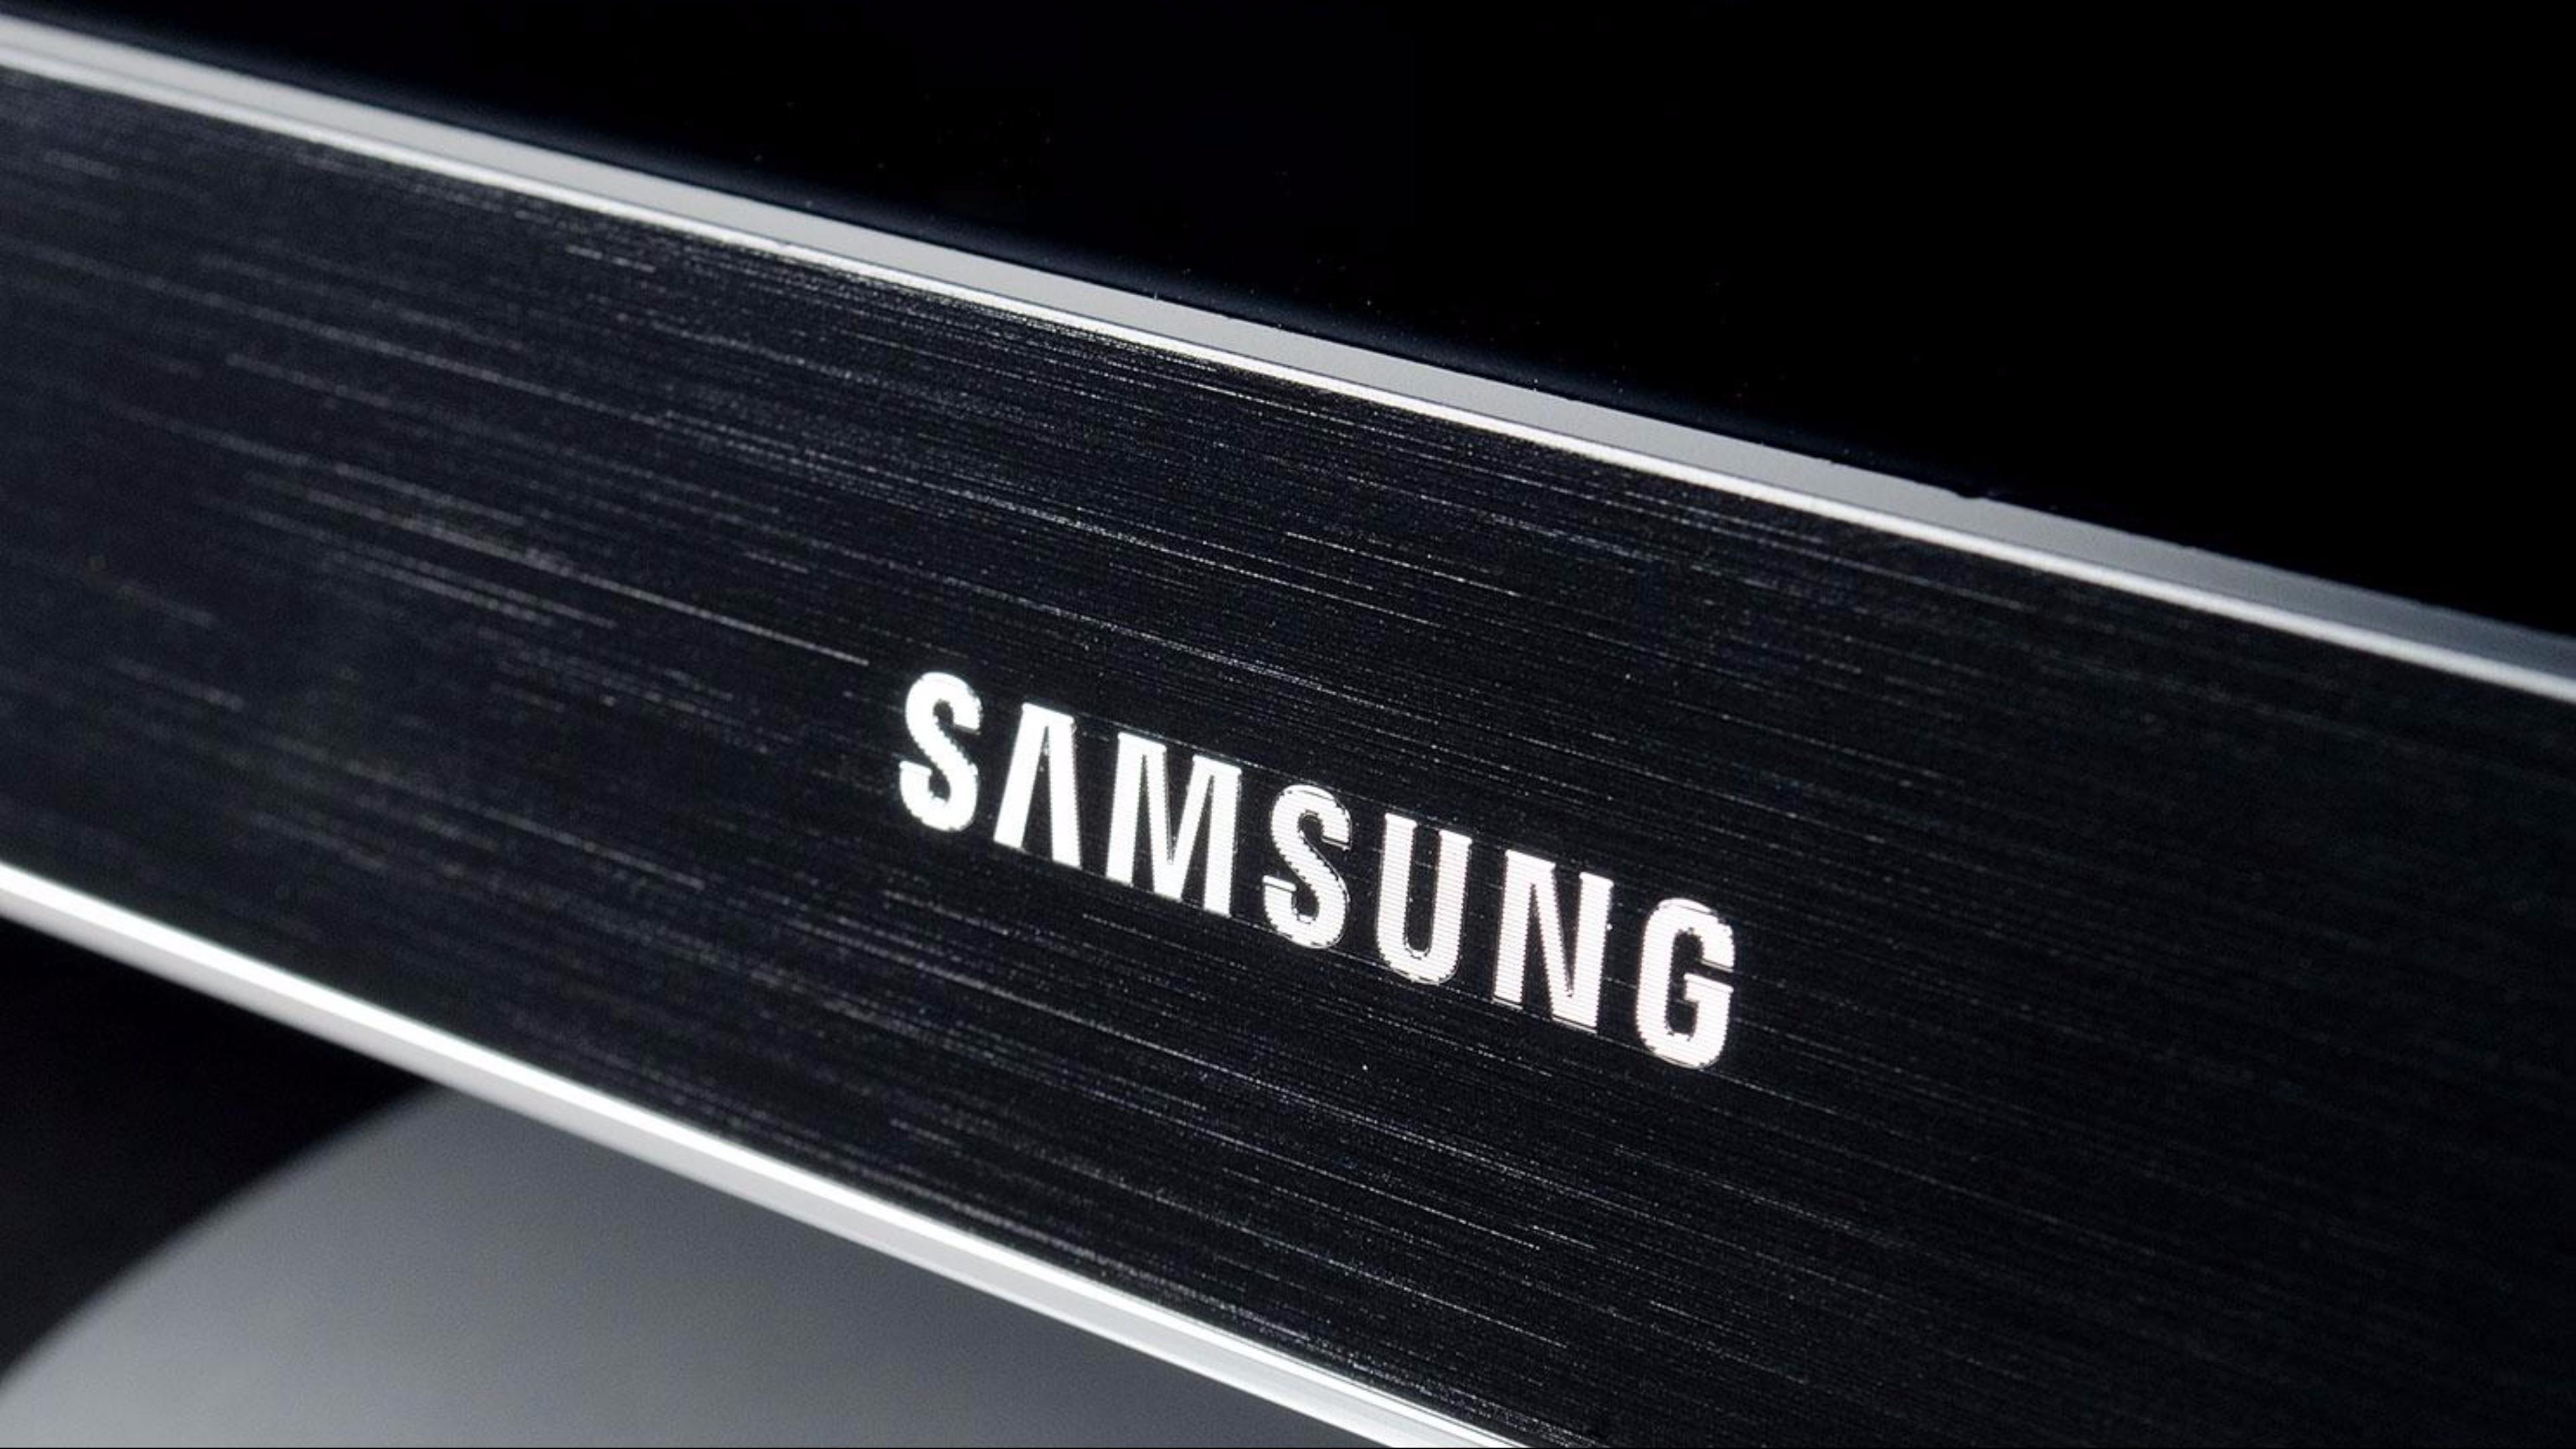 98 Samsung Galaxy Logo Wallpapers On Wallpapersafari